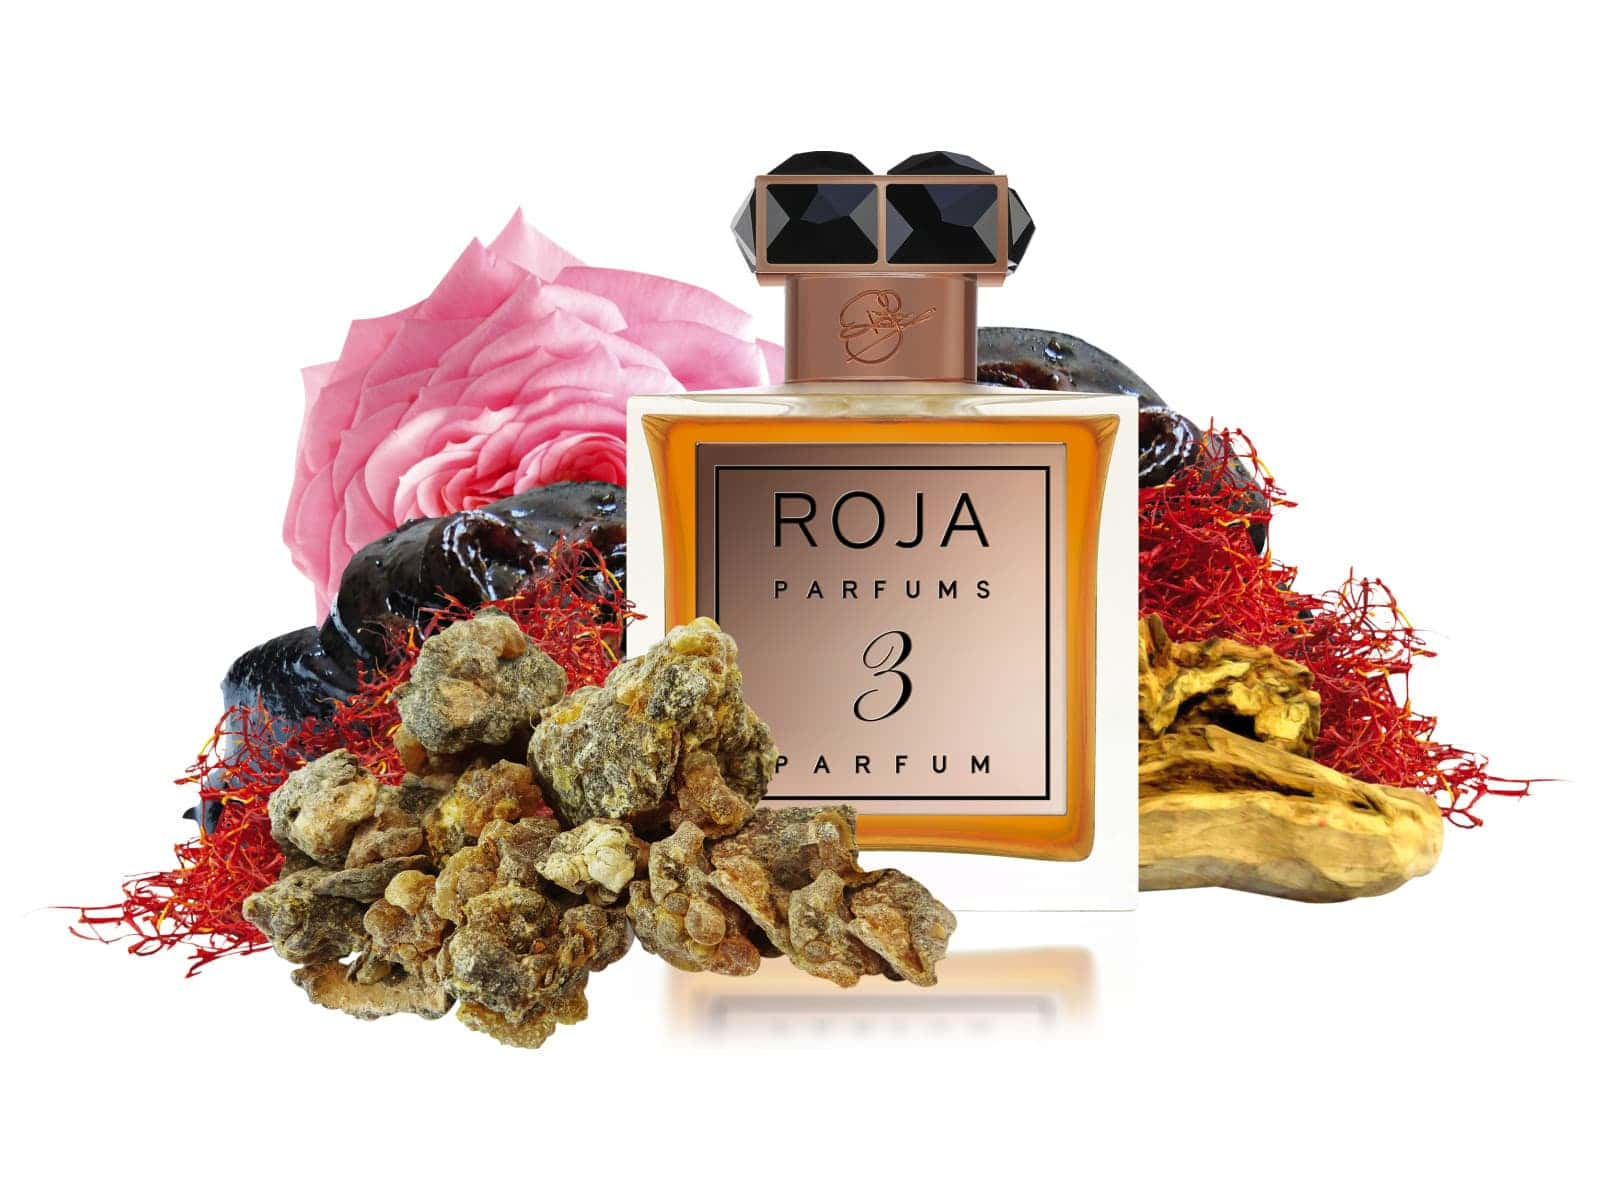 Roja Parfums - Parfum de la Nuit 3 - Extrait de Parfum - Duftnoten